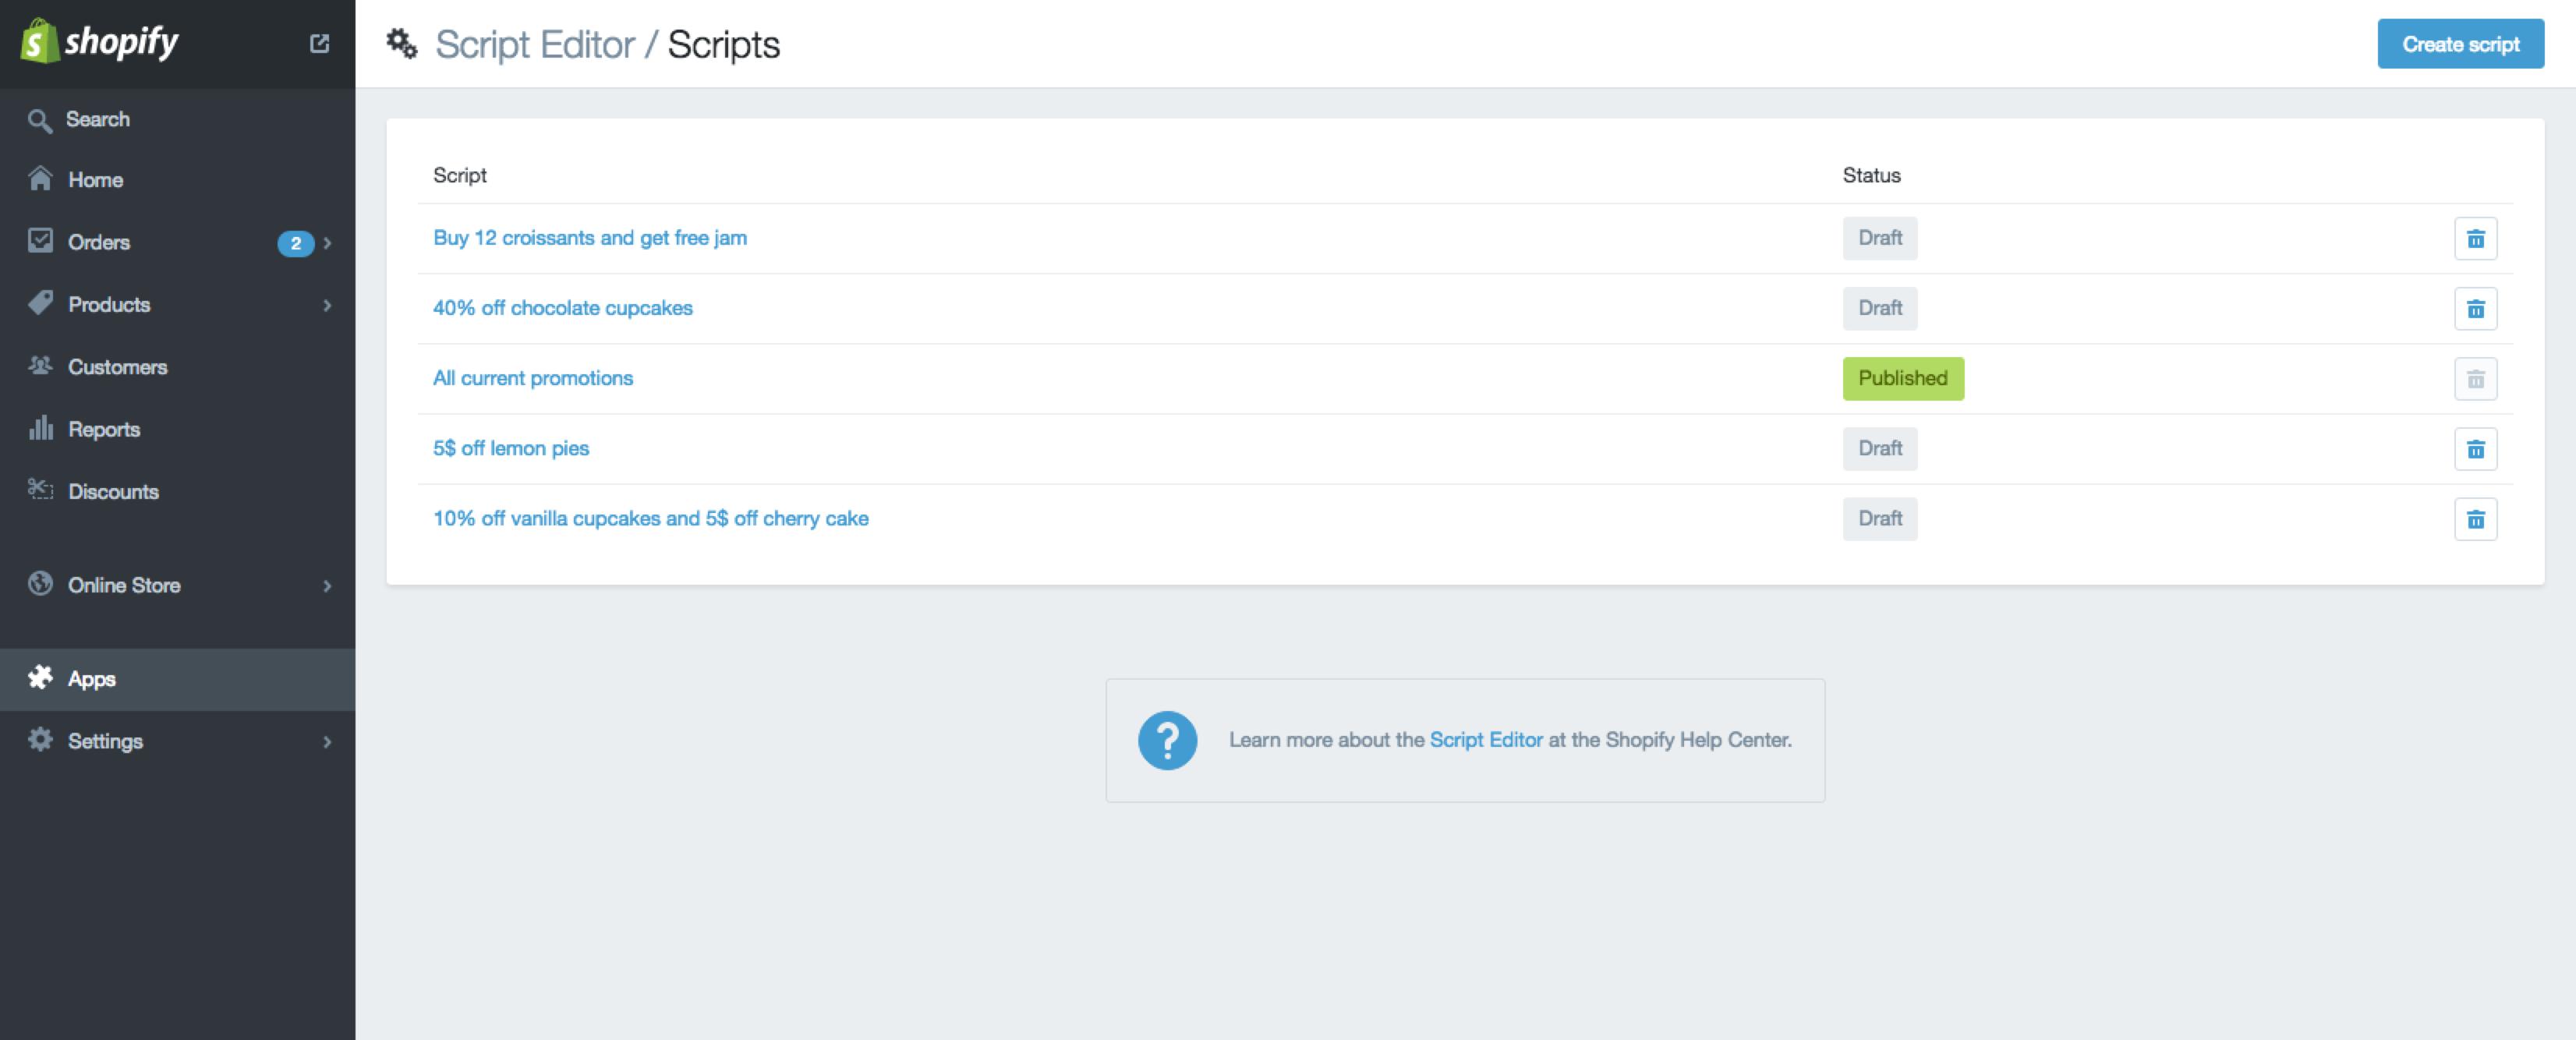 Script Editor - Shopify template editor